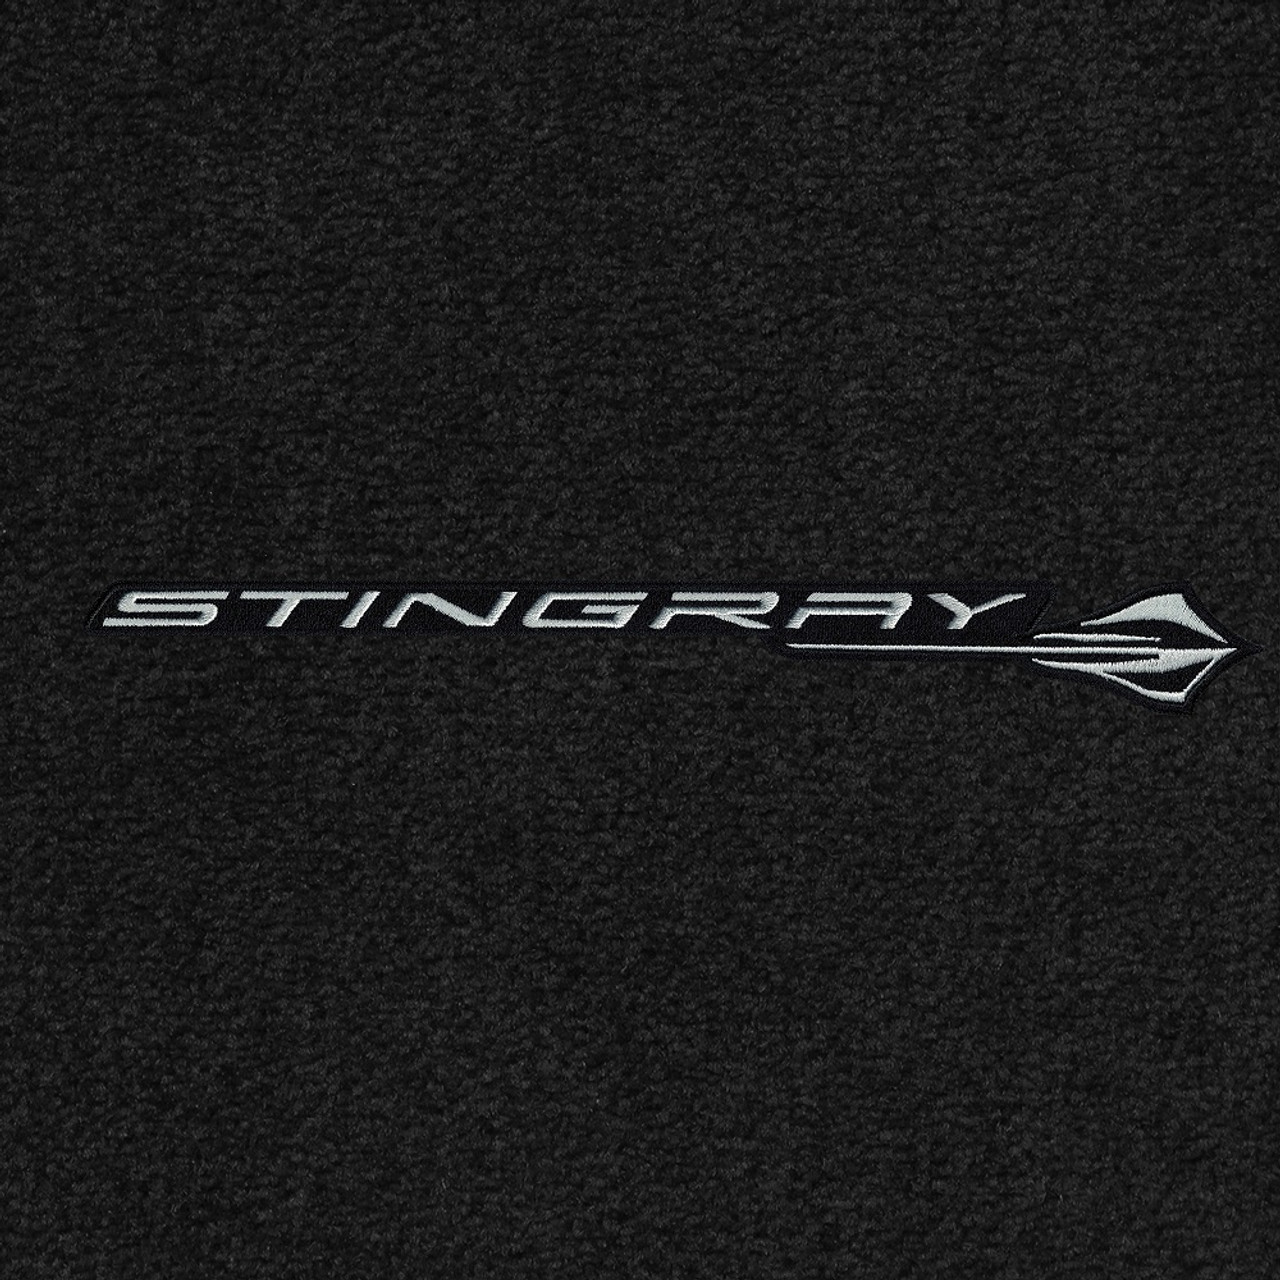 819411 - C8 Stingray Logo and Stingray Word Combo